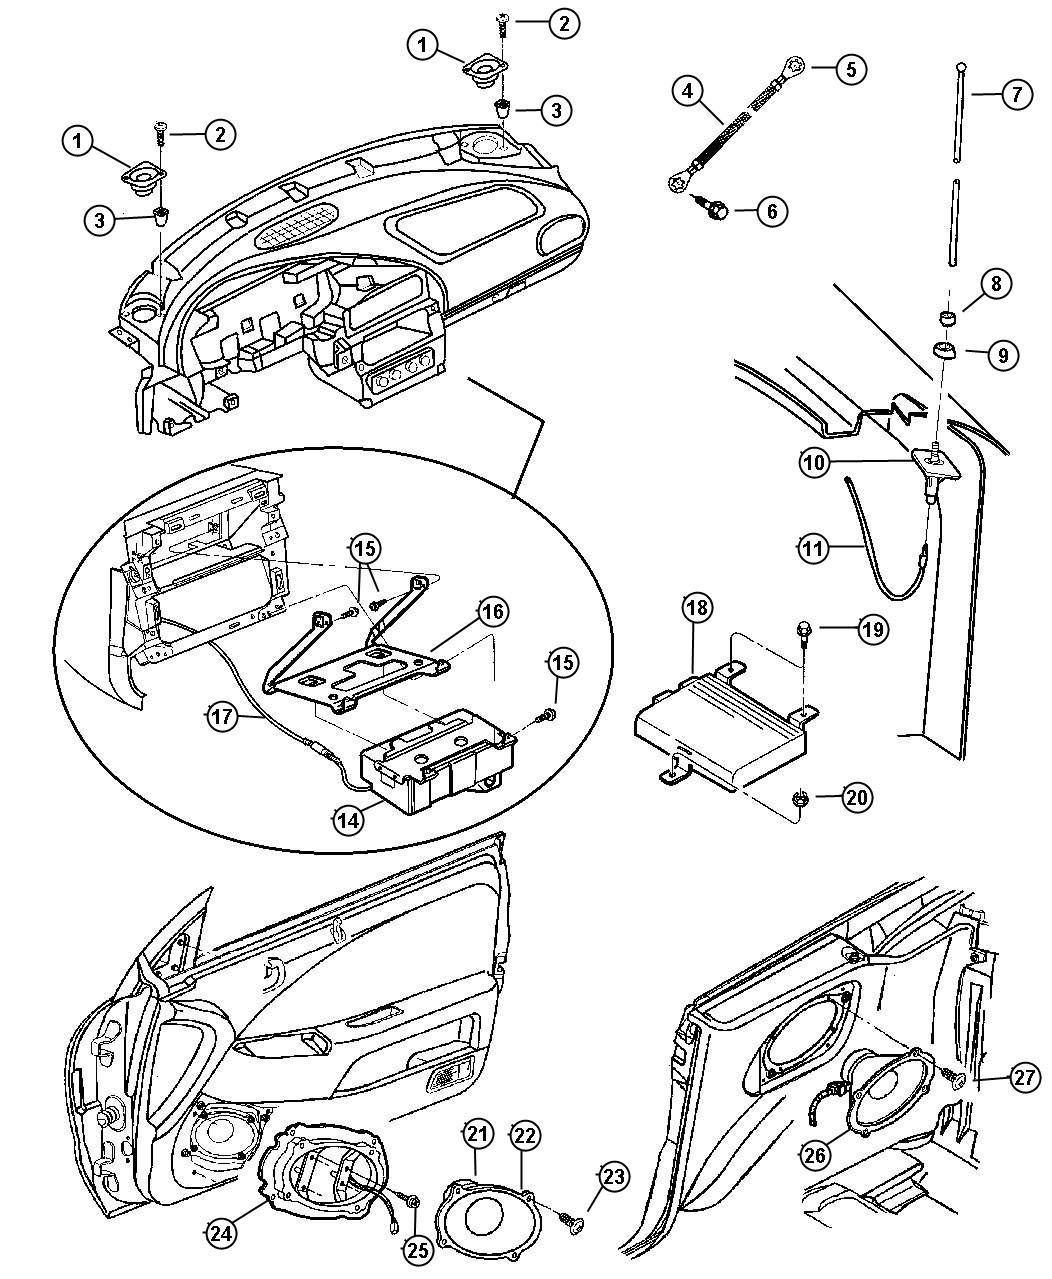 1999 Chrysler Sebring Amplifier. Radio. Audio system